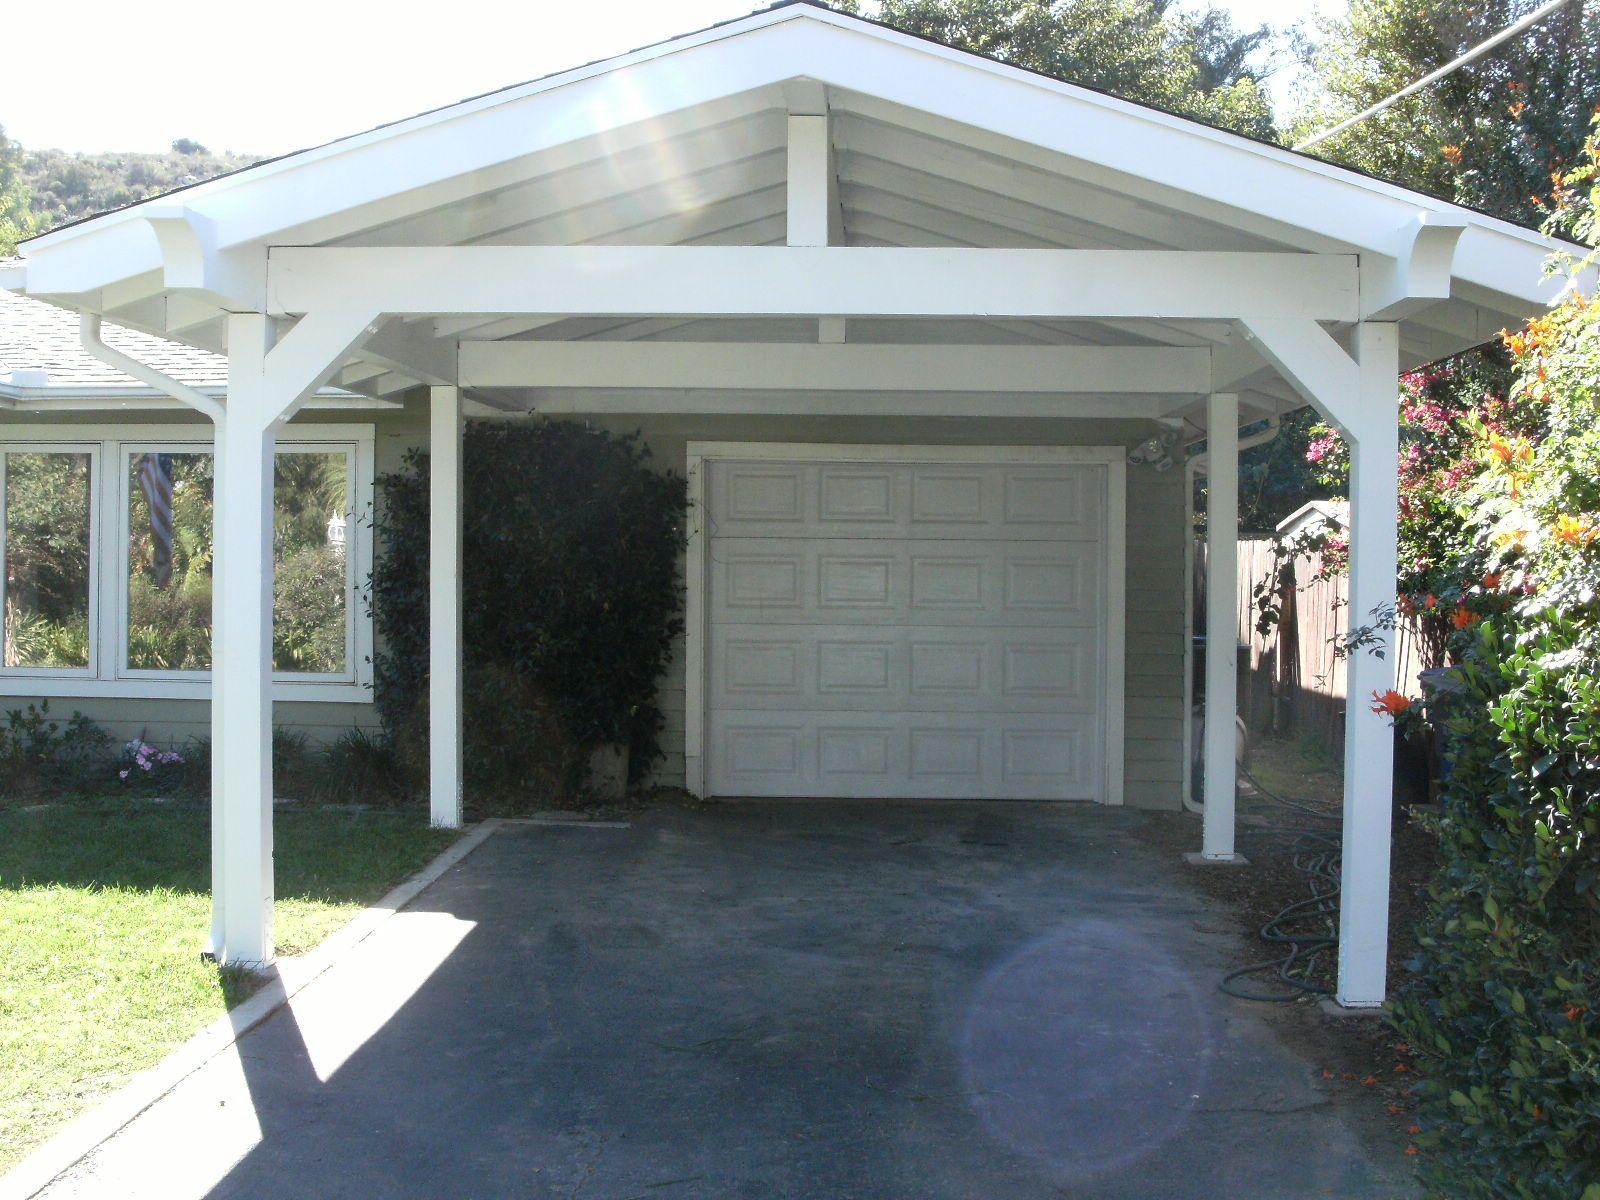 Carport Attached Google Search Carport Designs Carport Garage